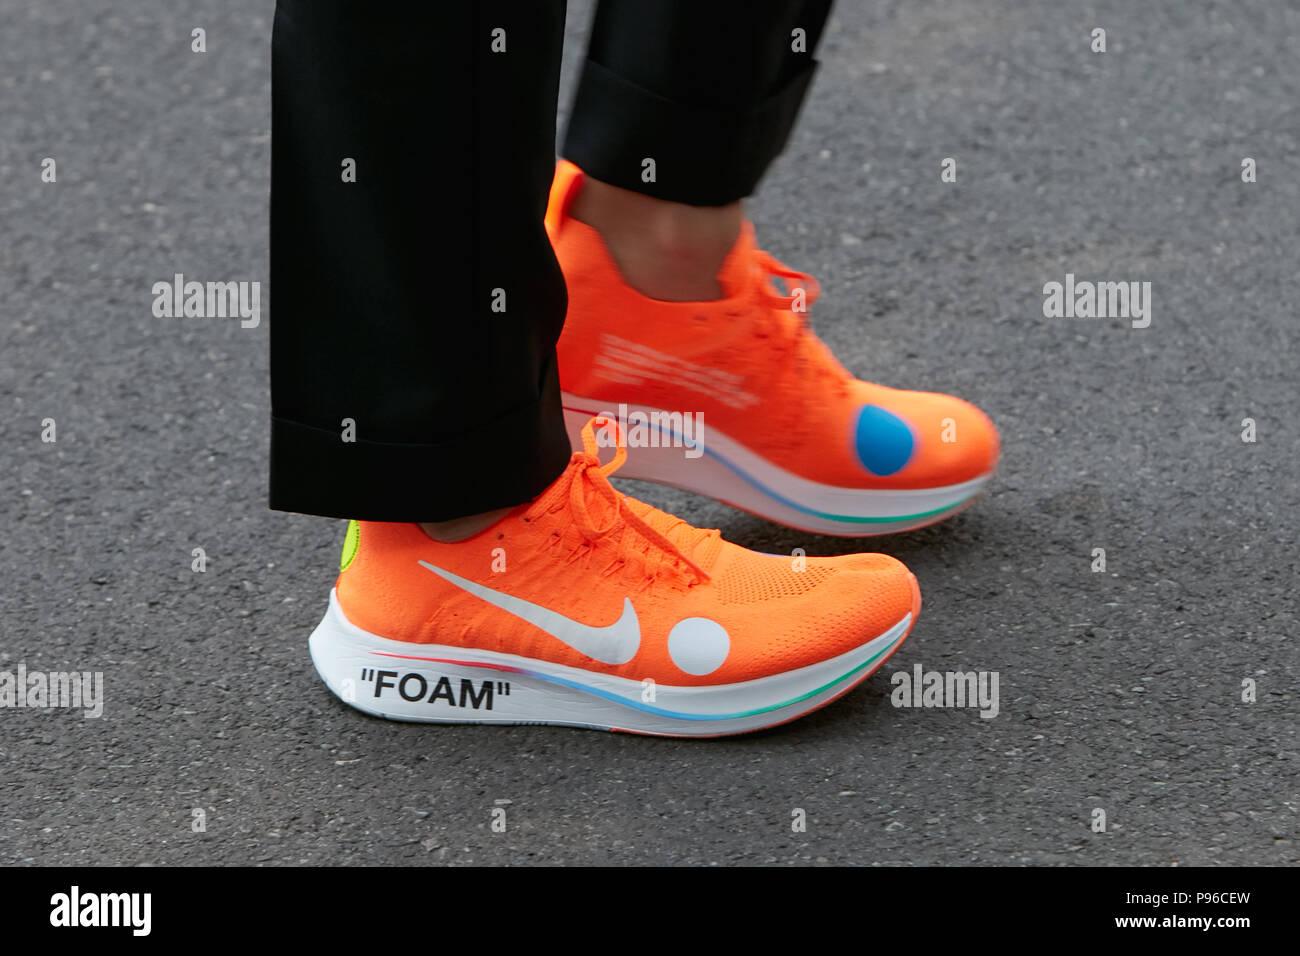 Espuma Milán Junio Zapatos Nike 18 Naranja Hombre Con Antes De qrUqZAw